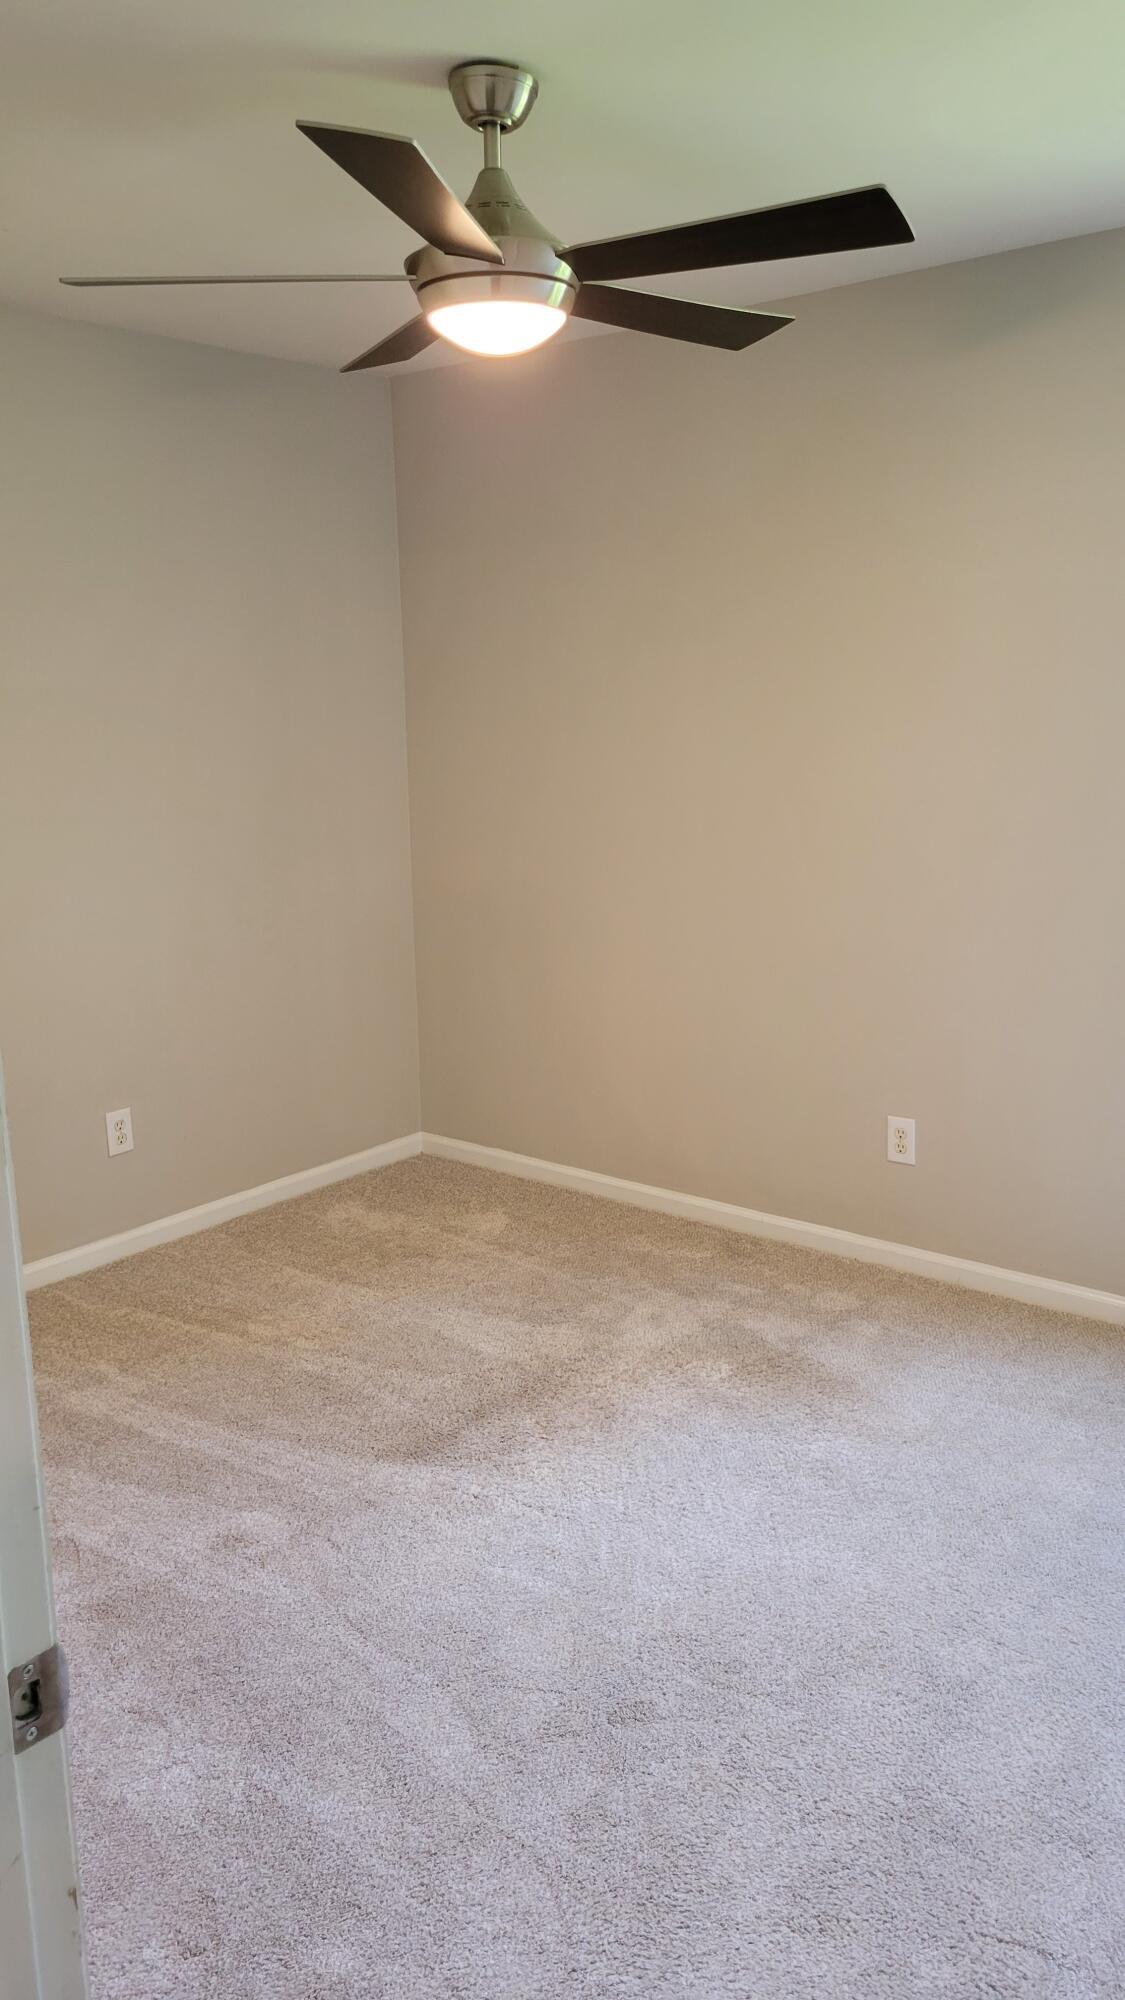 Dunes West Homes For Sale - 2652 Palmetto Hall, Mount Pleasant, SC - 13